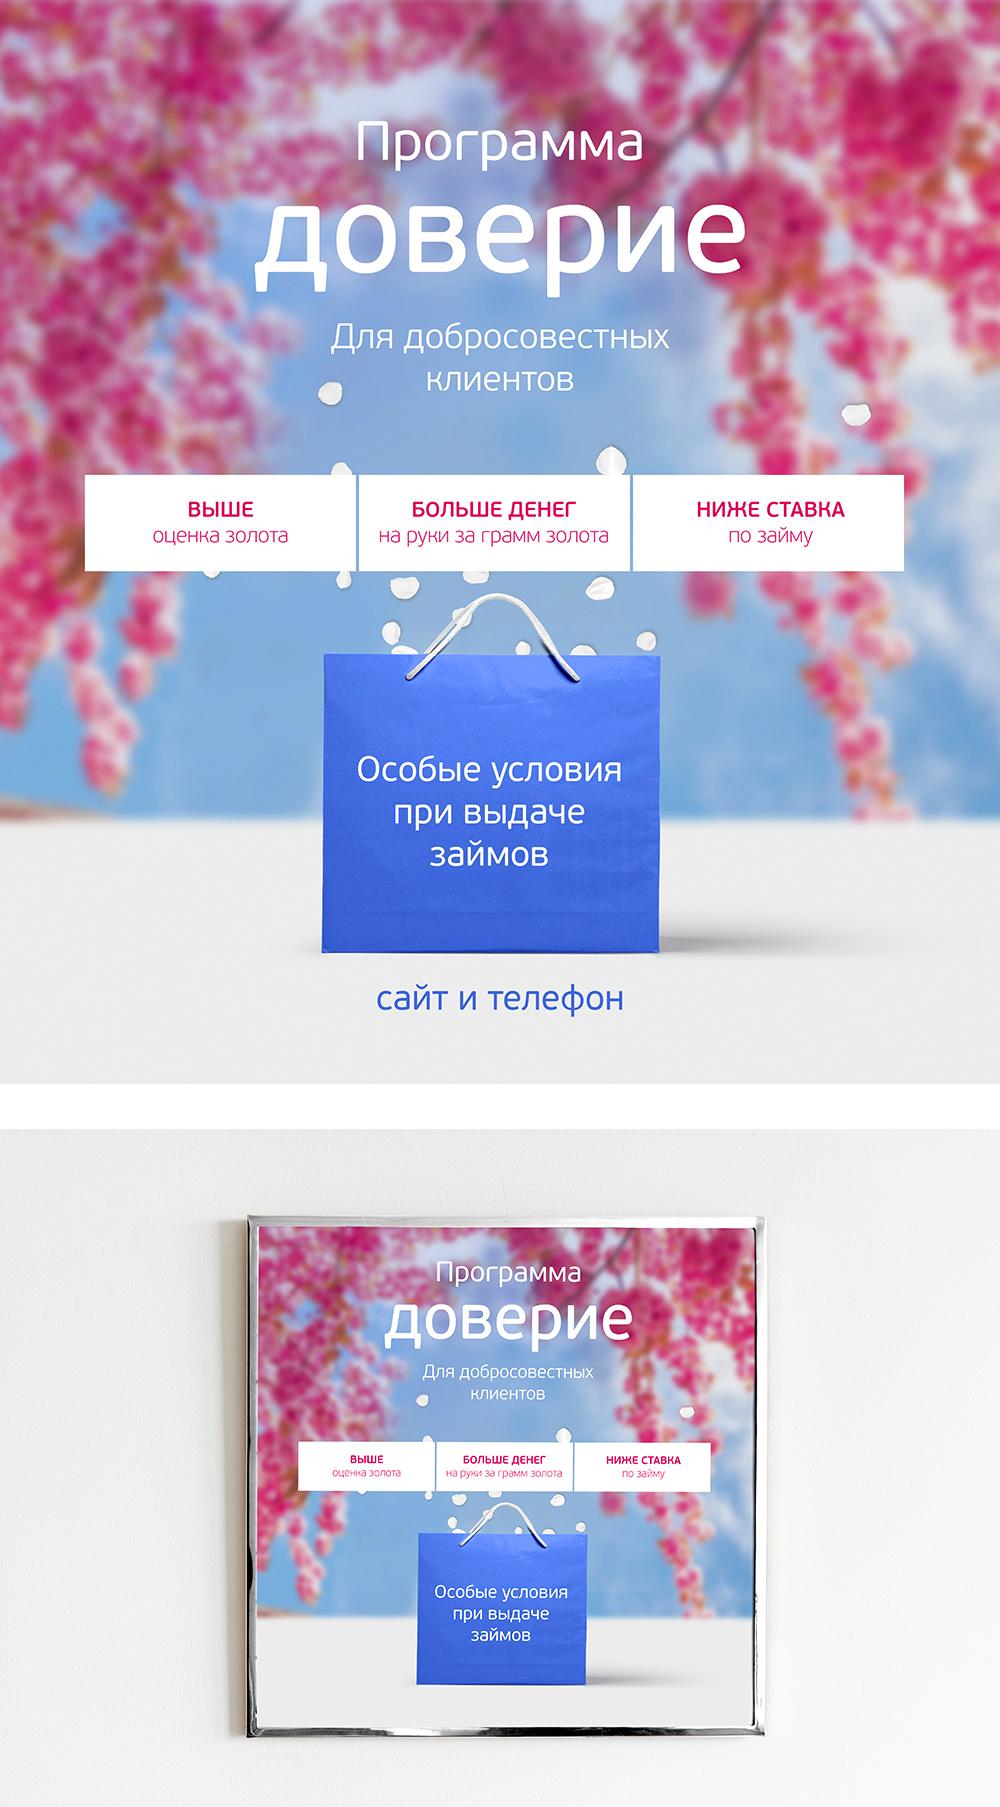 Дизайн плаката по программе лояльности ломбарда фото f_3195c631e10c57be.jpg